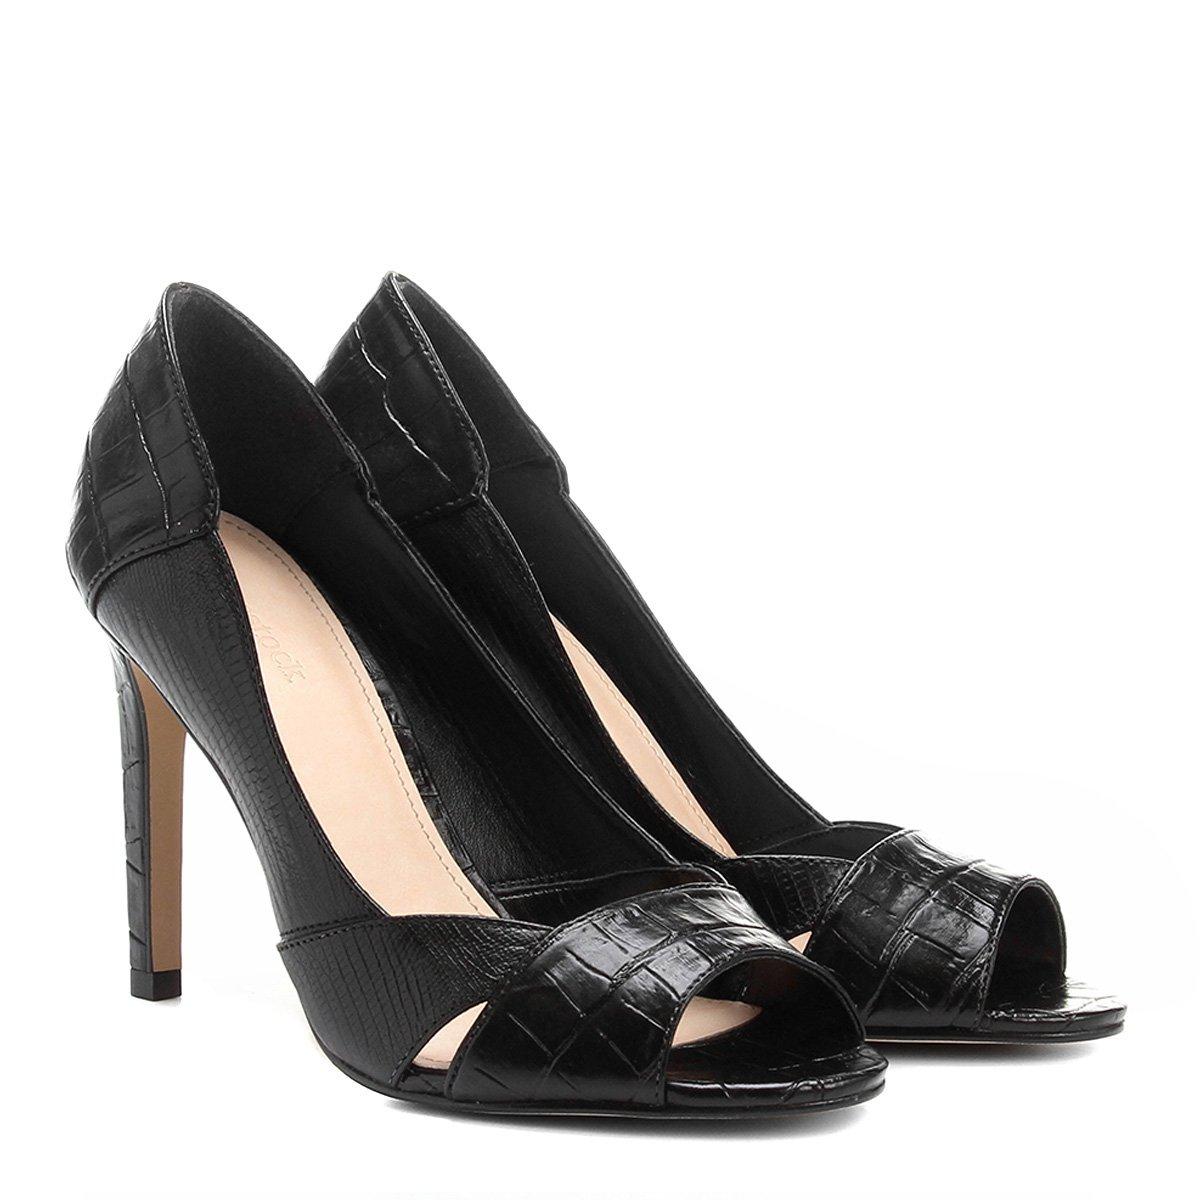 93c34e7758b23 Peep Toe Couro Shoestock Salto Fino Croco | Shoestock